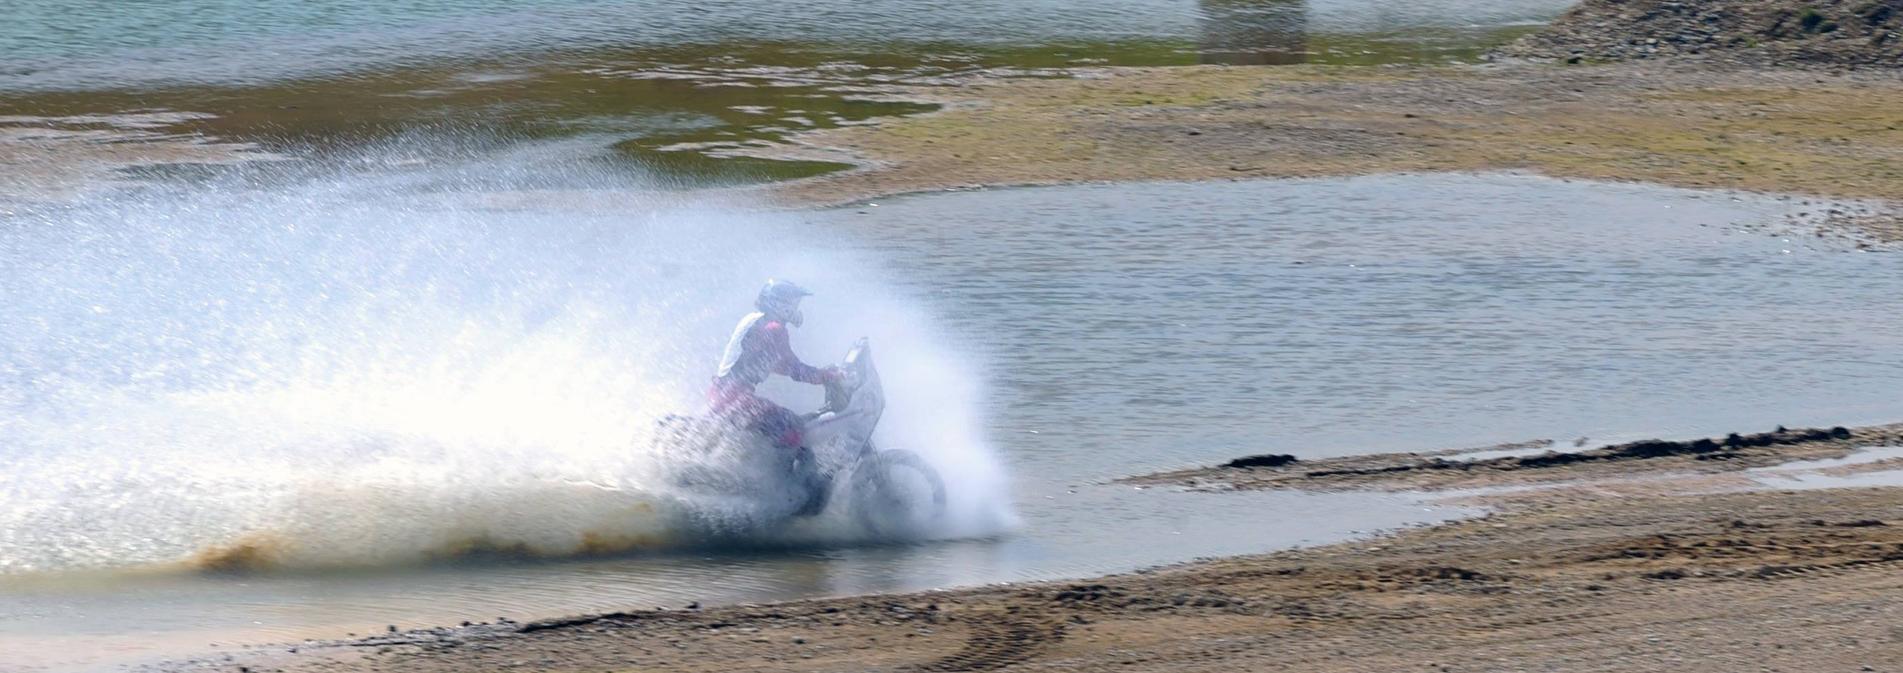 Wassertest BMW RallyeBike